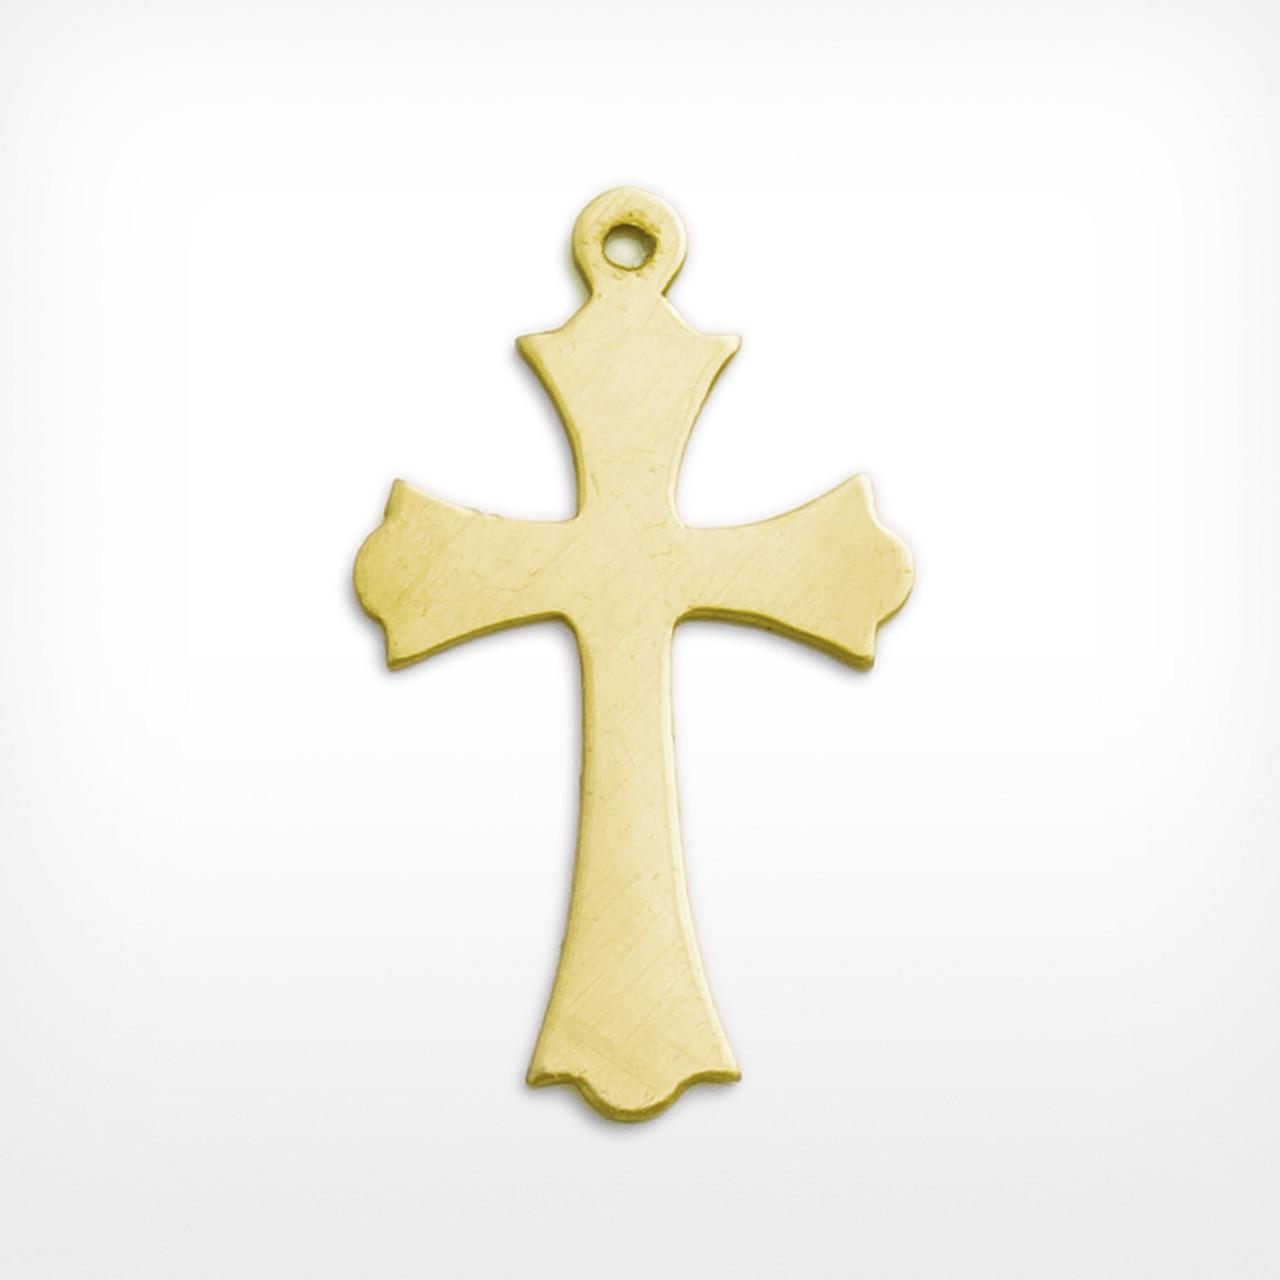 Brass cross for craft jewellery making